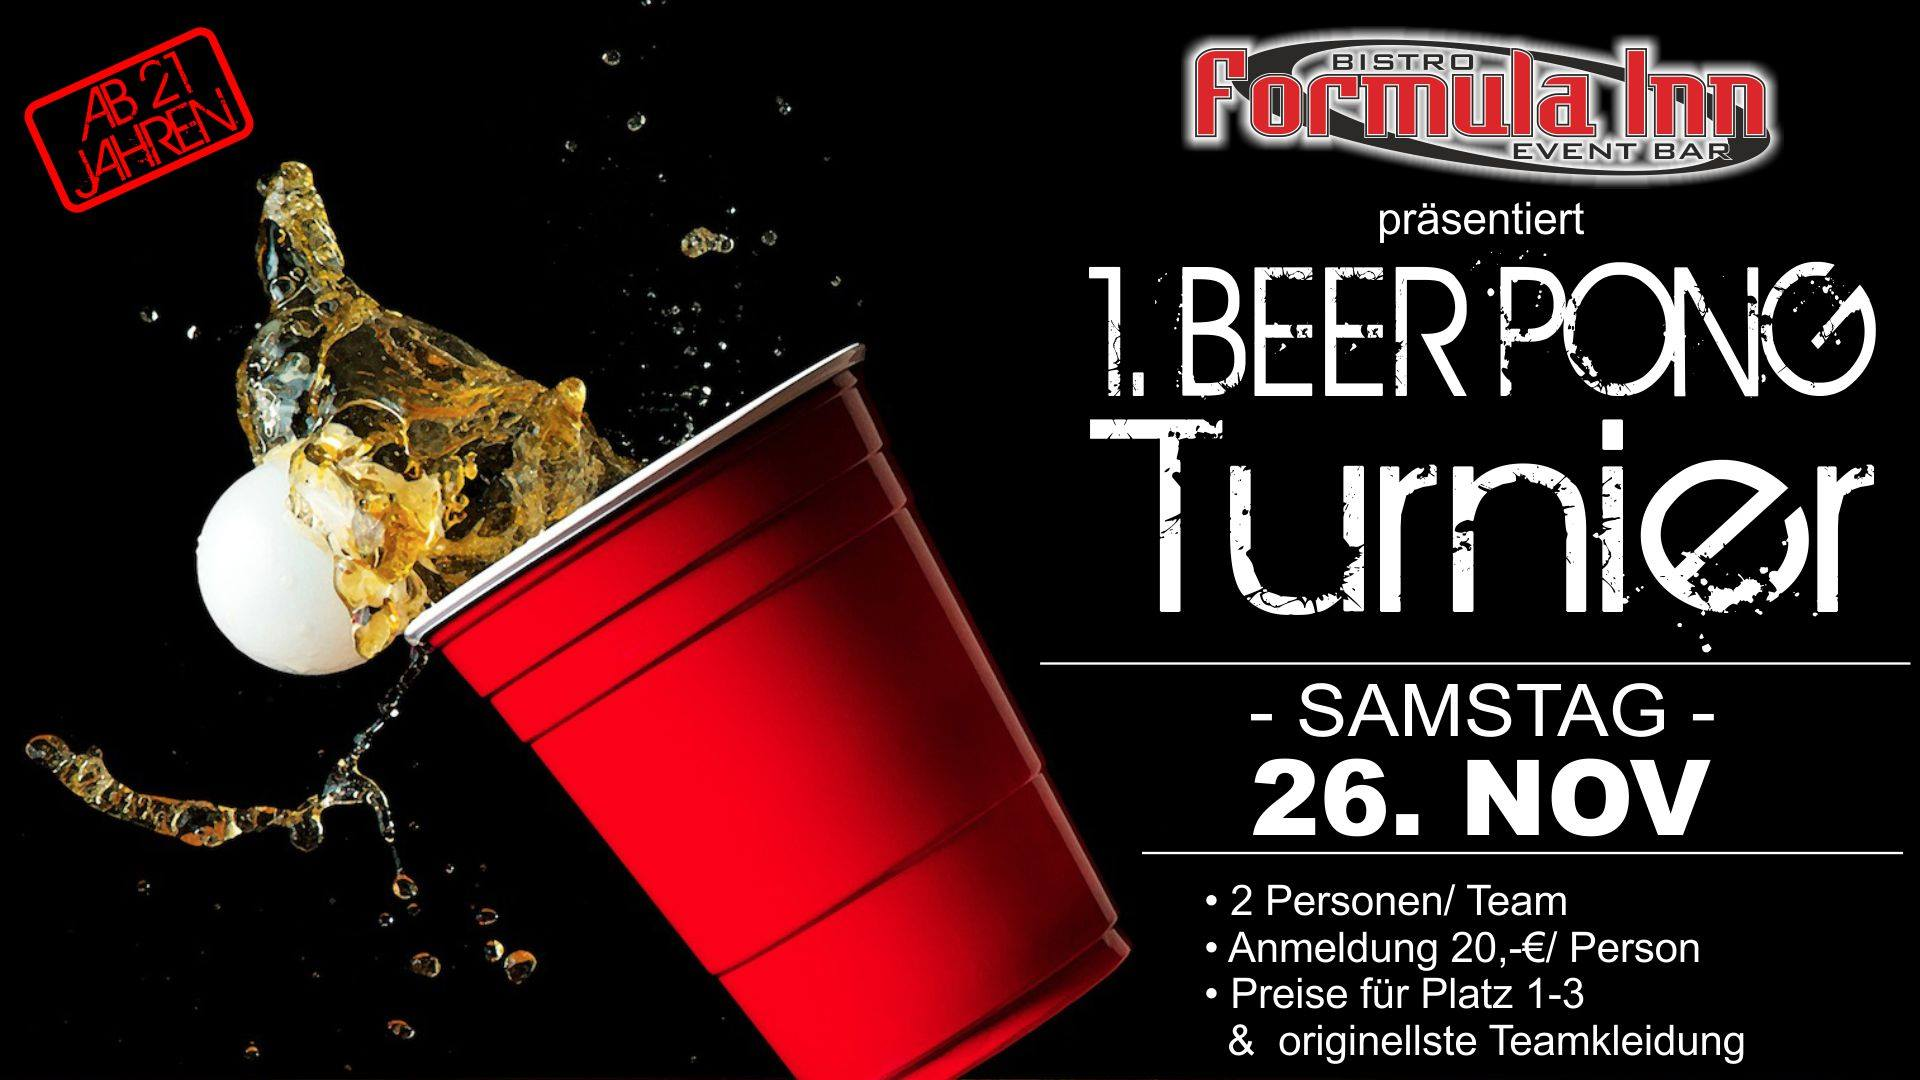 Beer Pong Turnier Plan